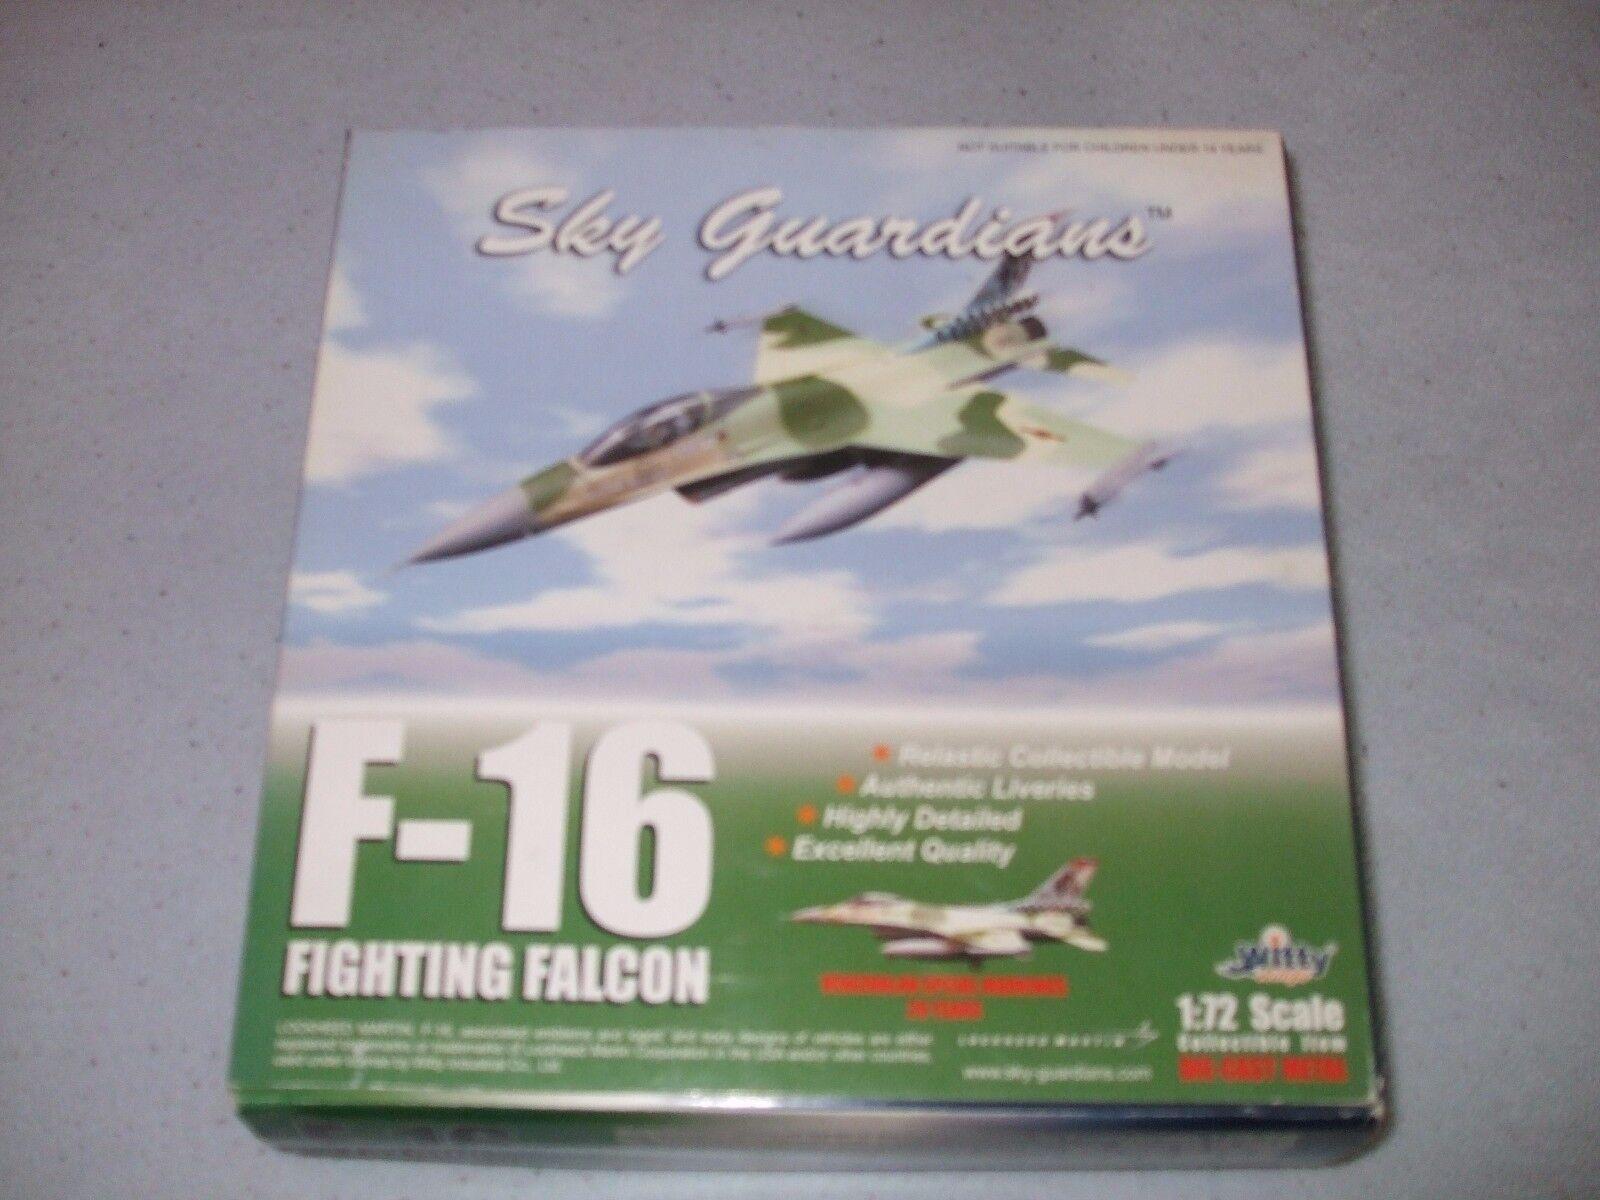 Sky GUARDIANS-F 16 Fighting Falcon